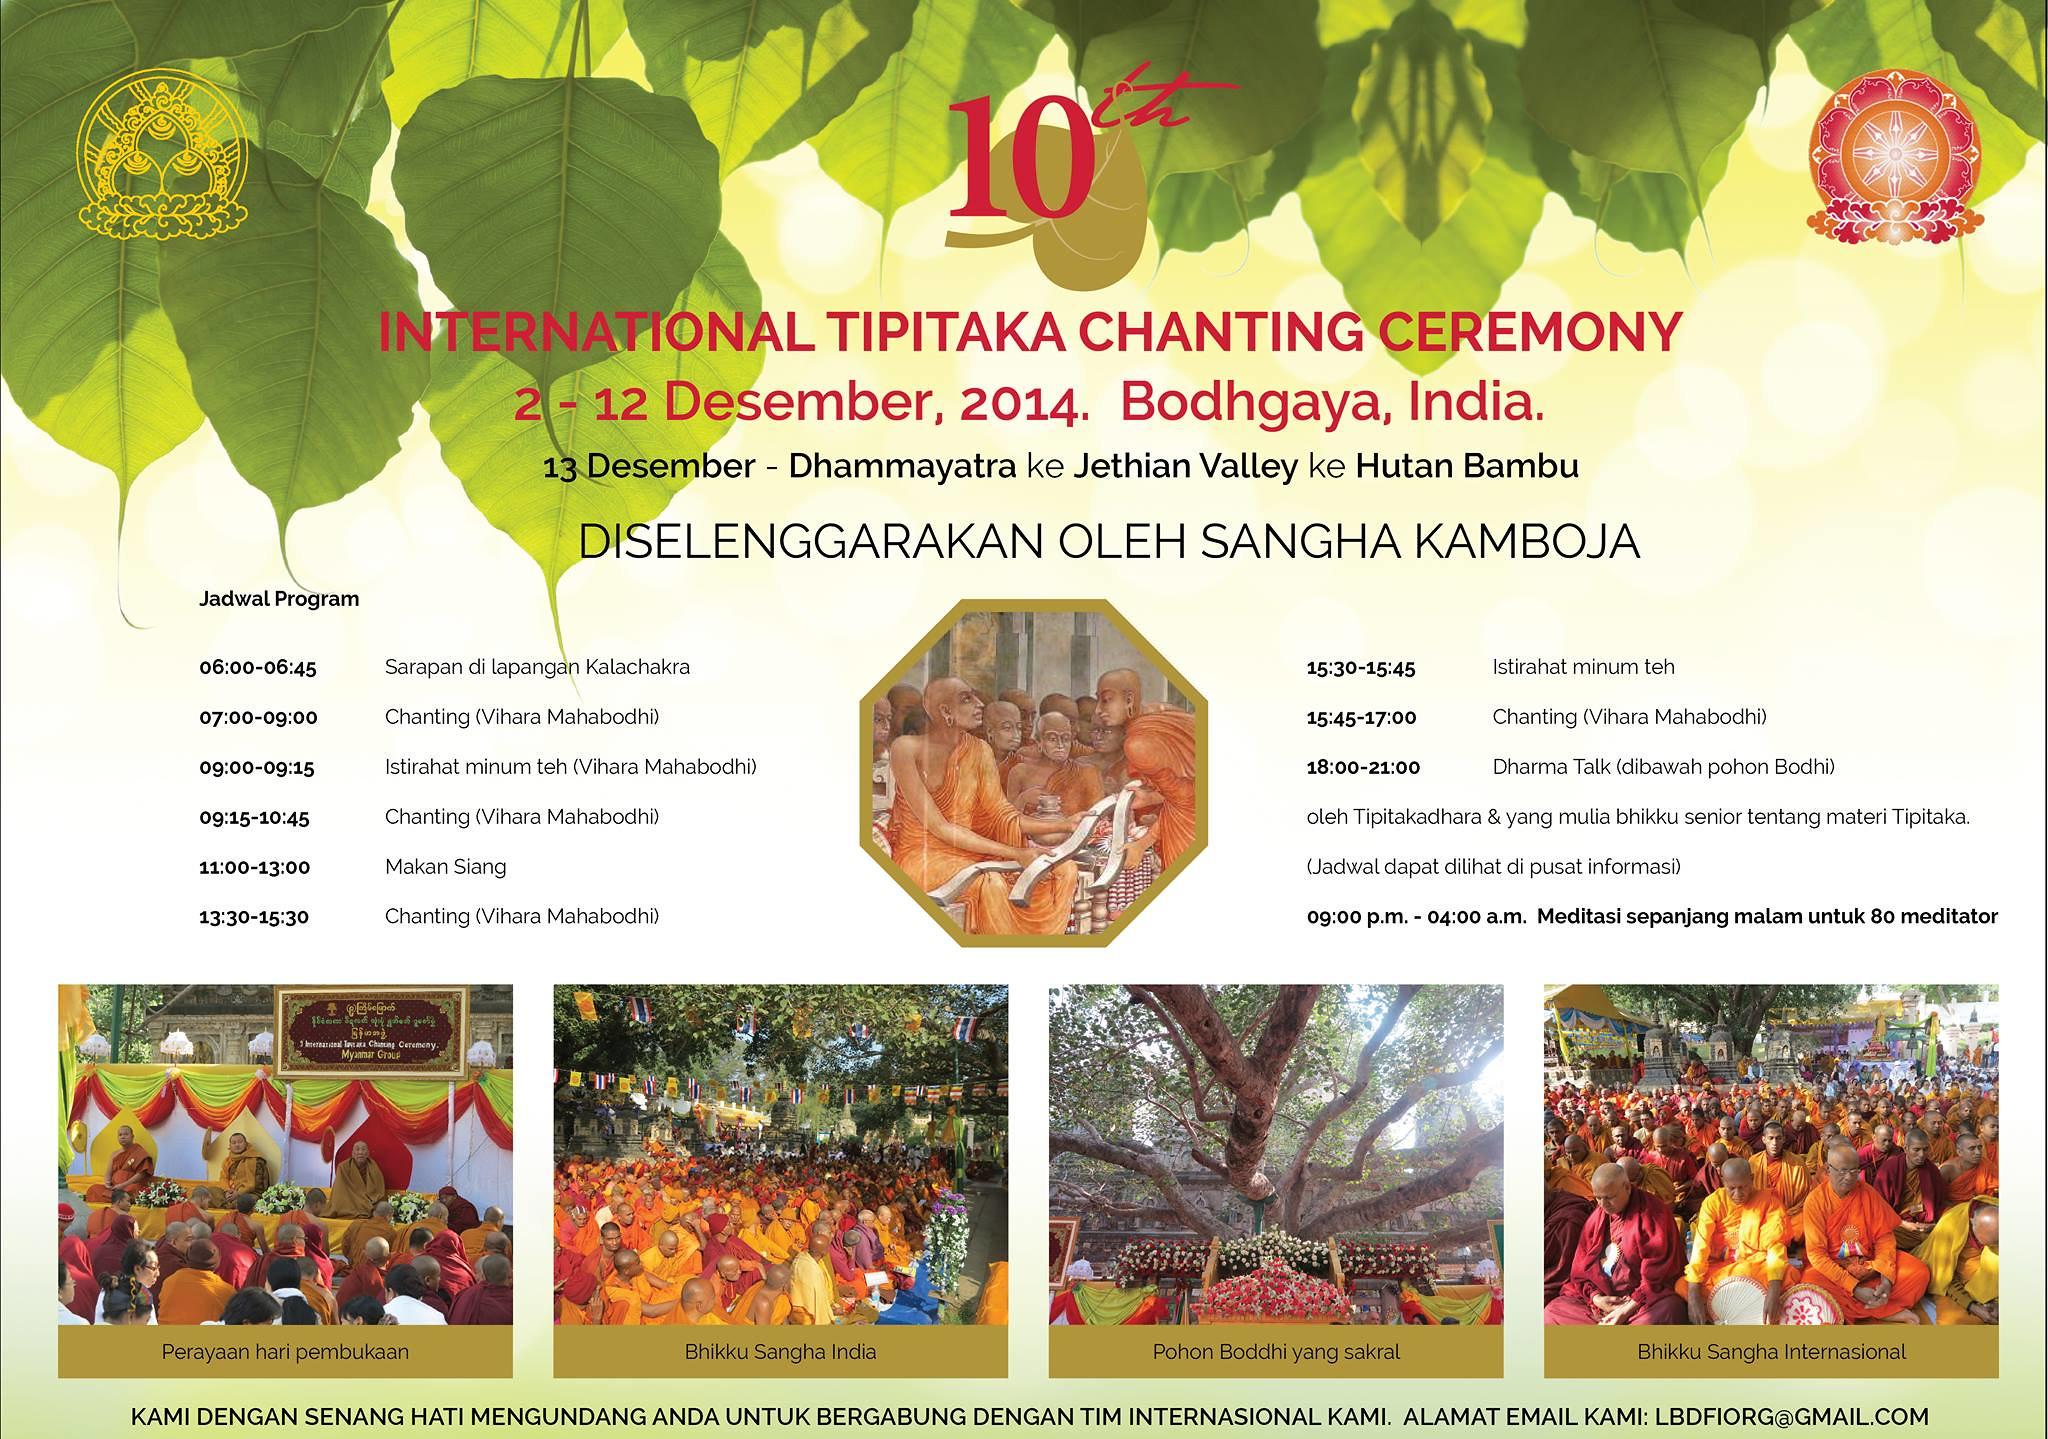 Program acara Upacara Pelantunan Tipitaka Internasional Ke-10, Bodh Gaya, india, 2-12 Desember 2014.